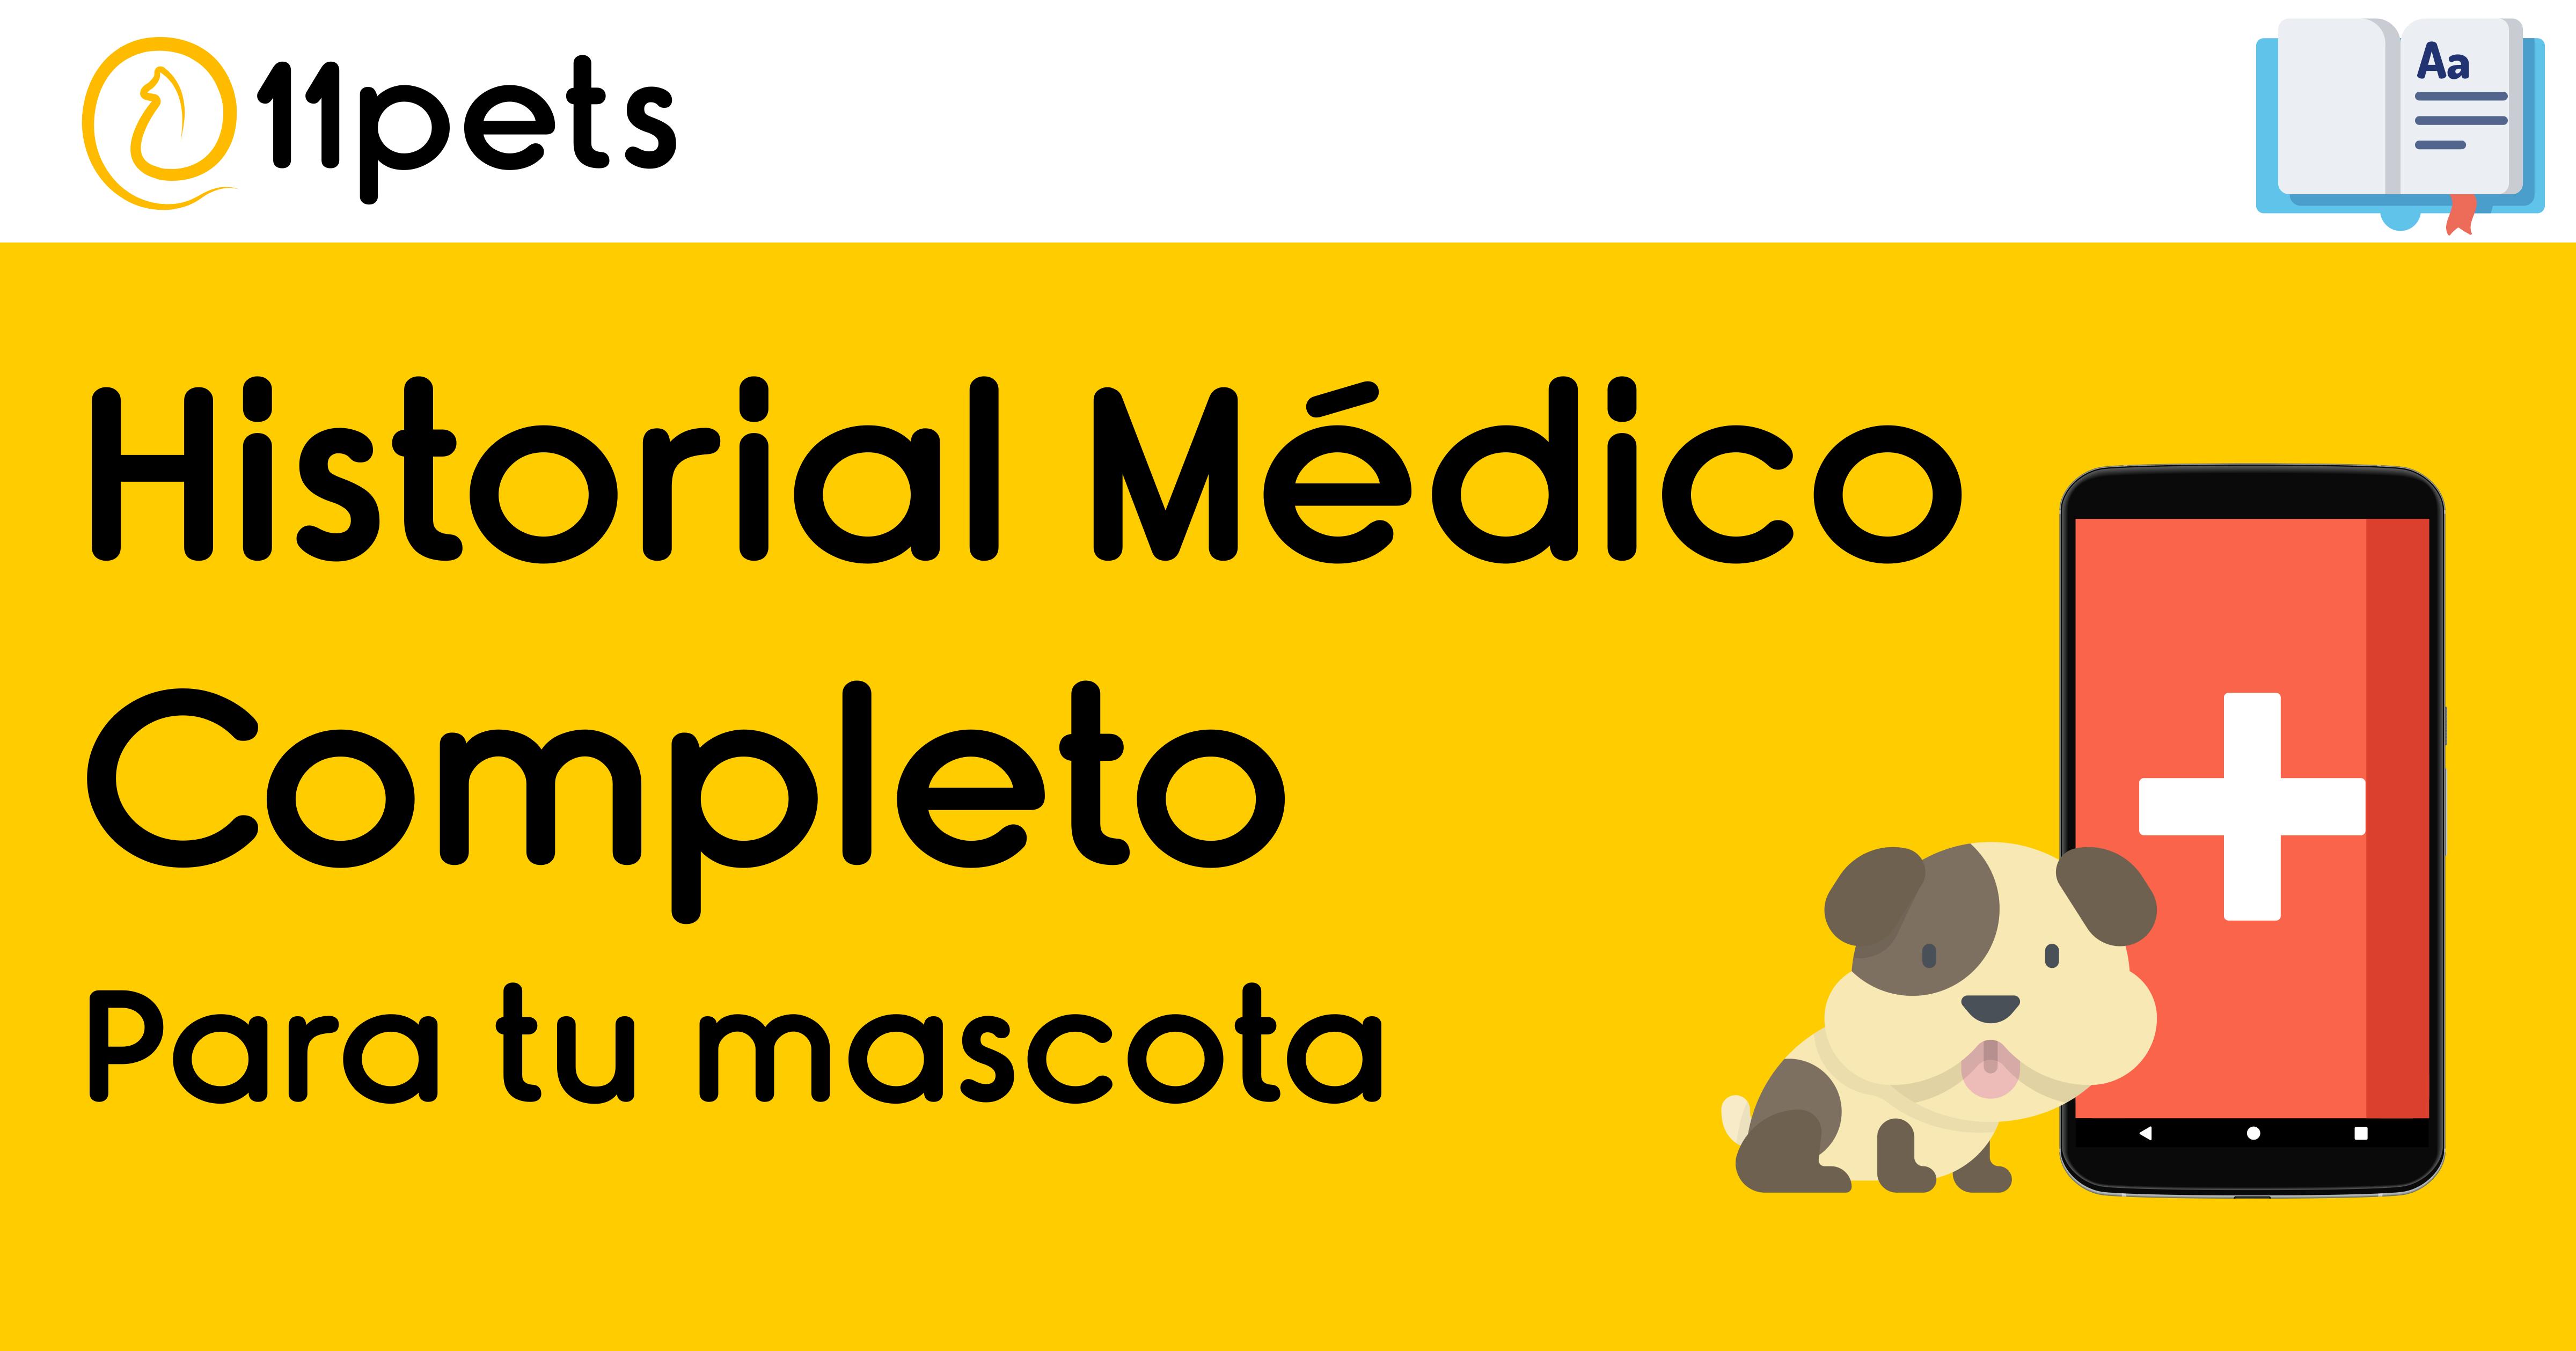 Mantén un historial médico completo para tu mascota con 11pets